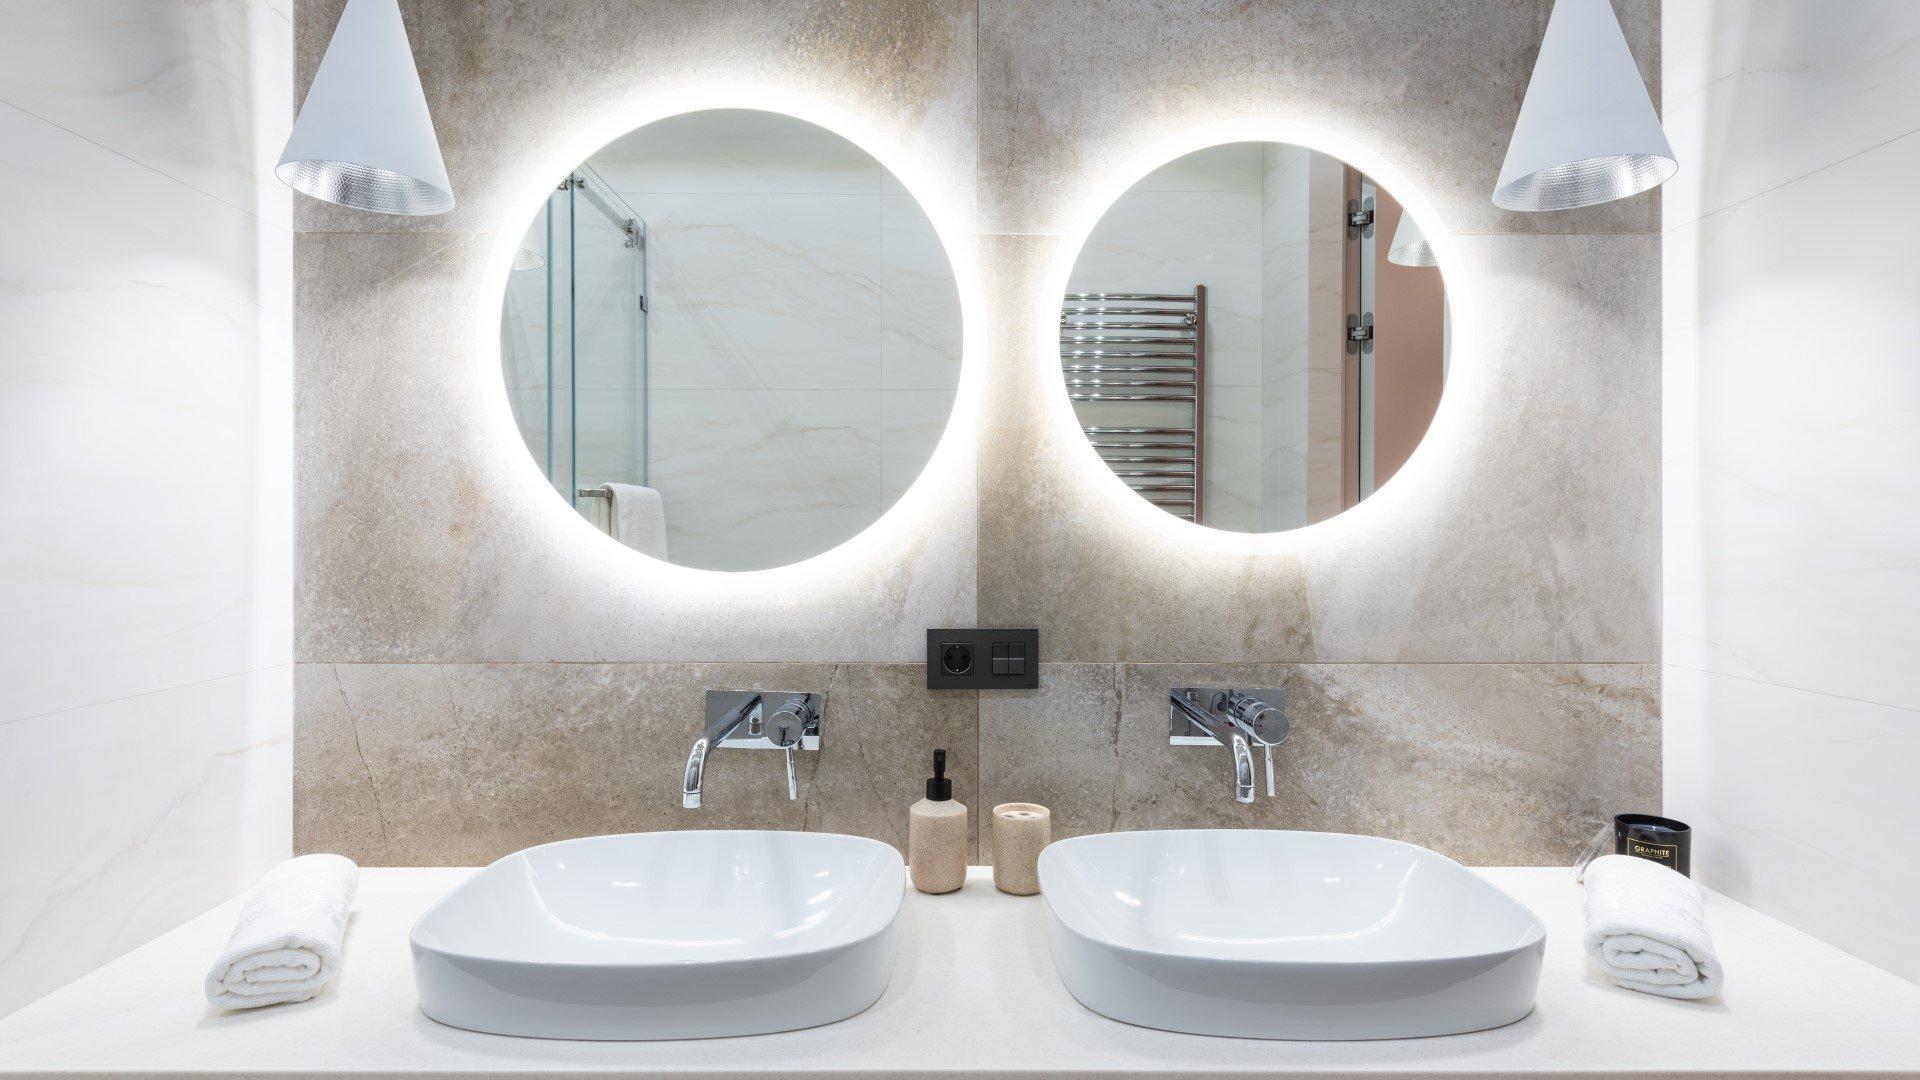 Our top 3 elegant bathroom trends for 2021 -Spa bathroom